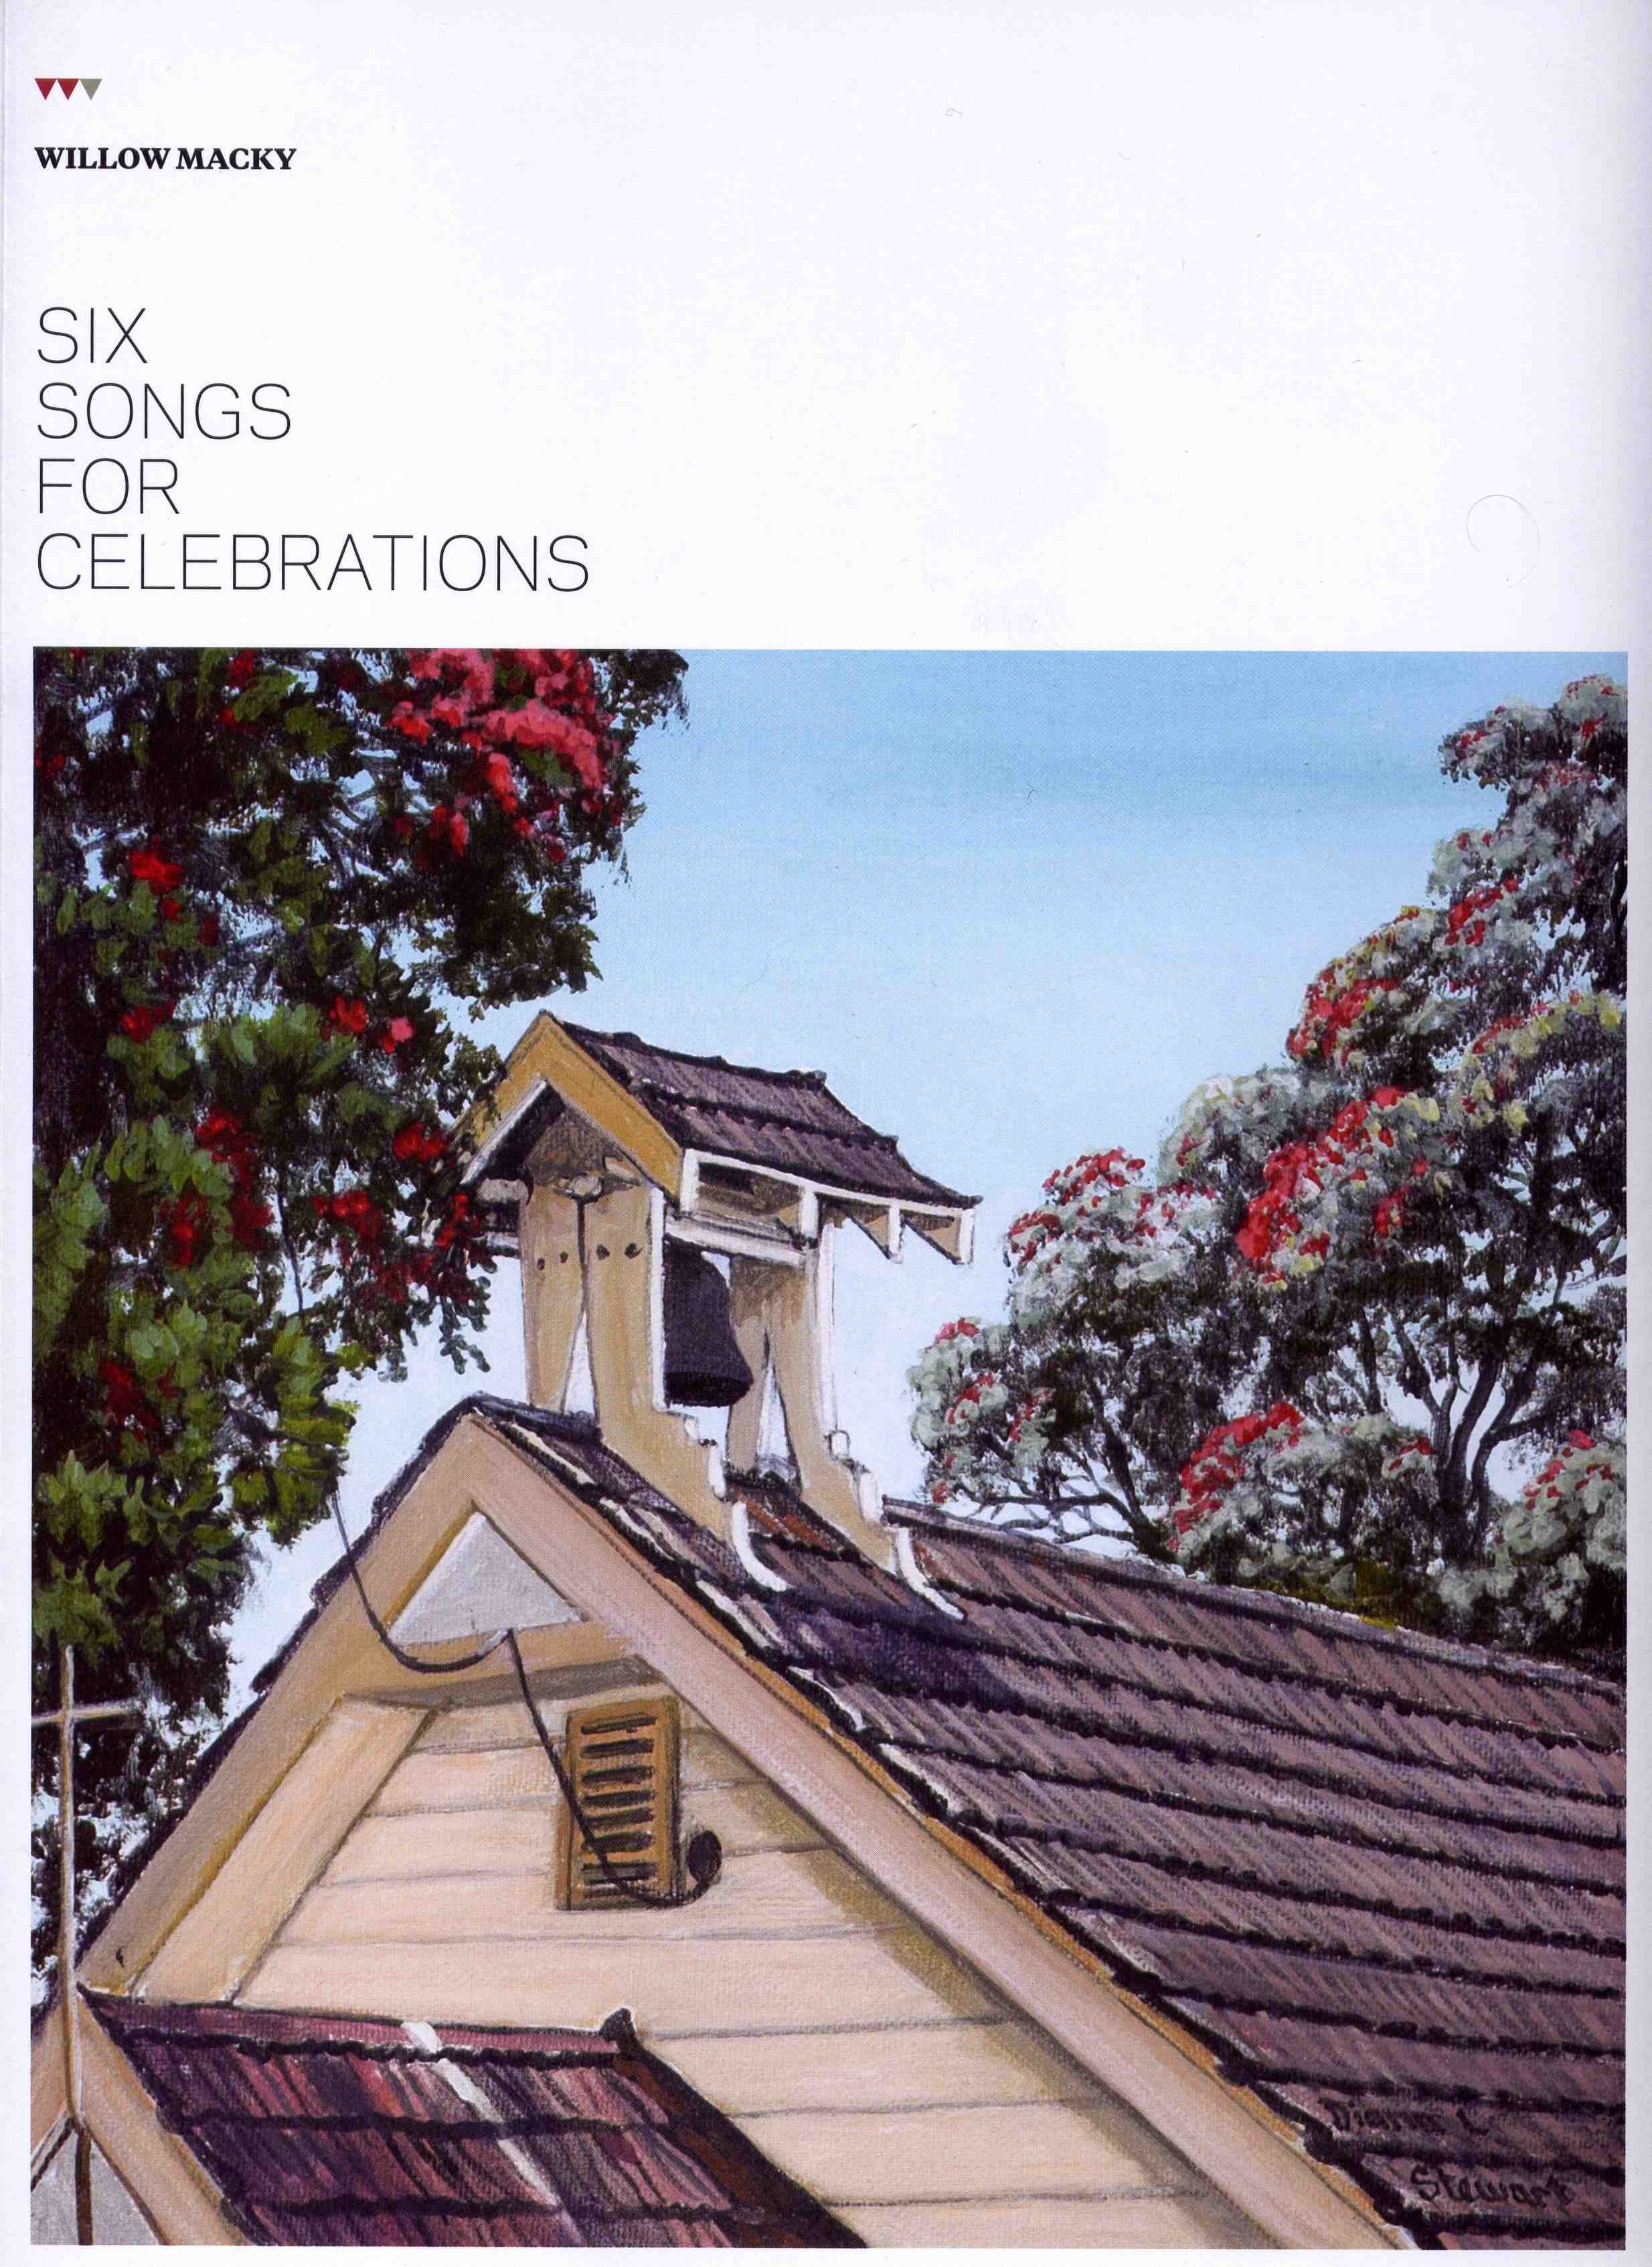 Willow Macky: Six Songs for Celebrations - hardcopy SCORE